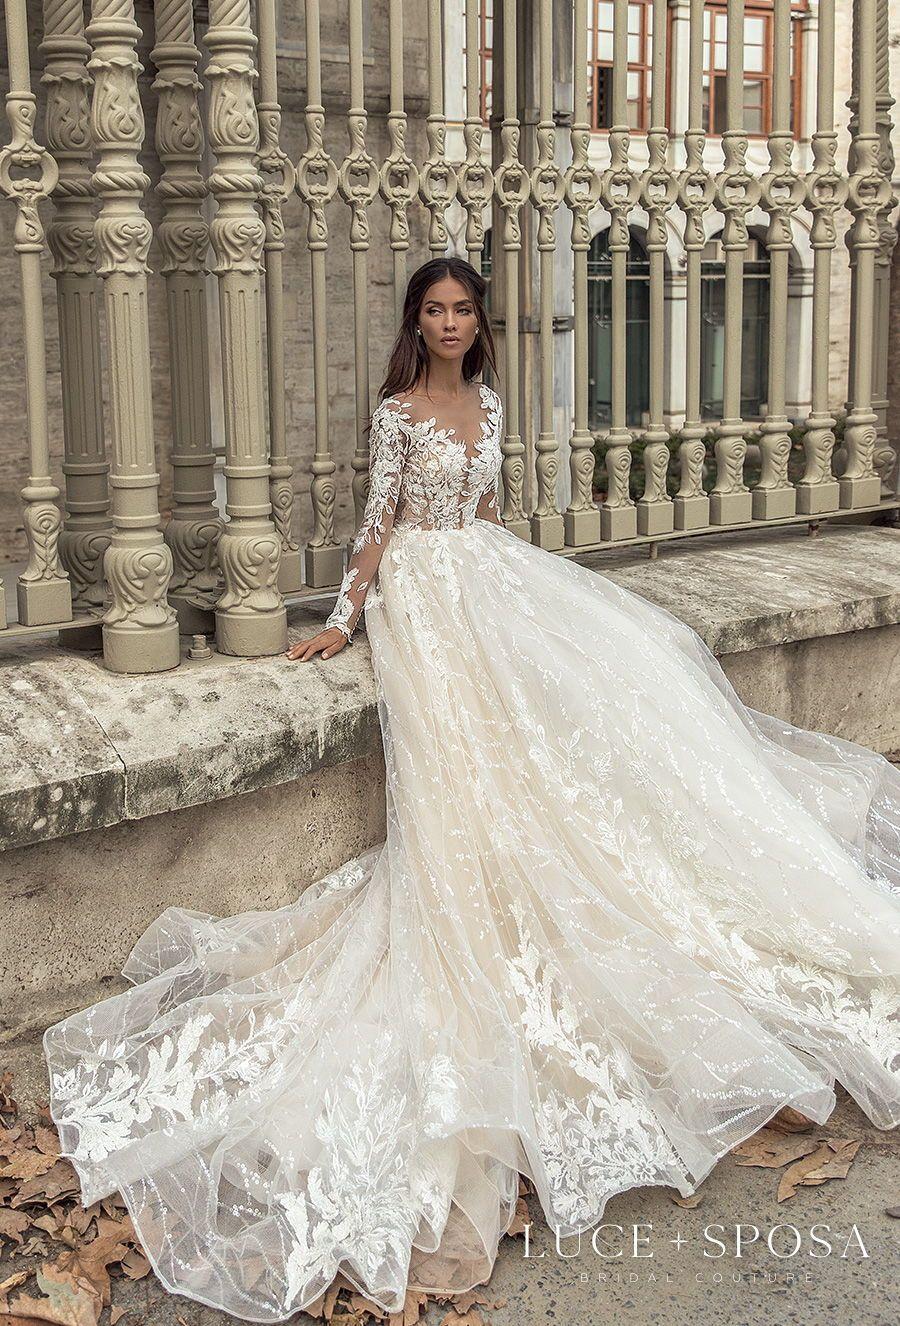 Luce Sposa Spring Summer 2021 Wedding Dresses Istanbul Paris Bridal Collections Wedding Inspirasi Wedding Dresses Boho Wedding Dress Lace Minimalist Wedding Dresses [ 1326 x 900 Pixel ]